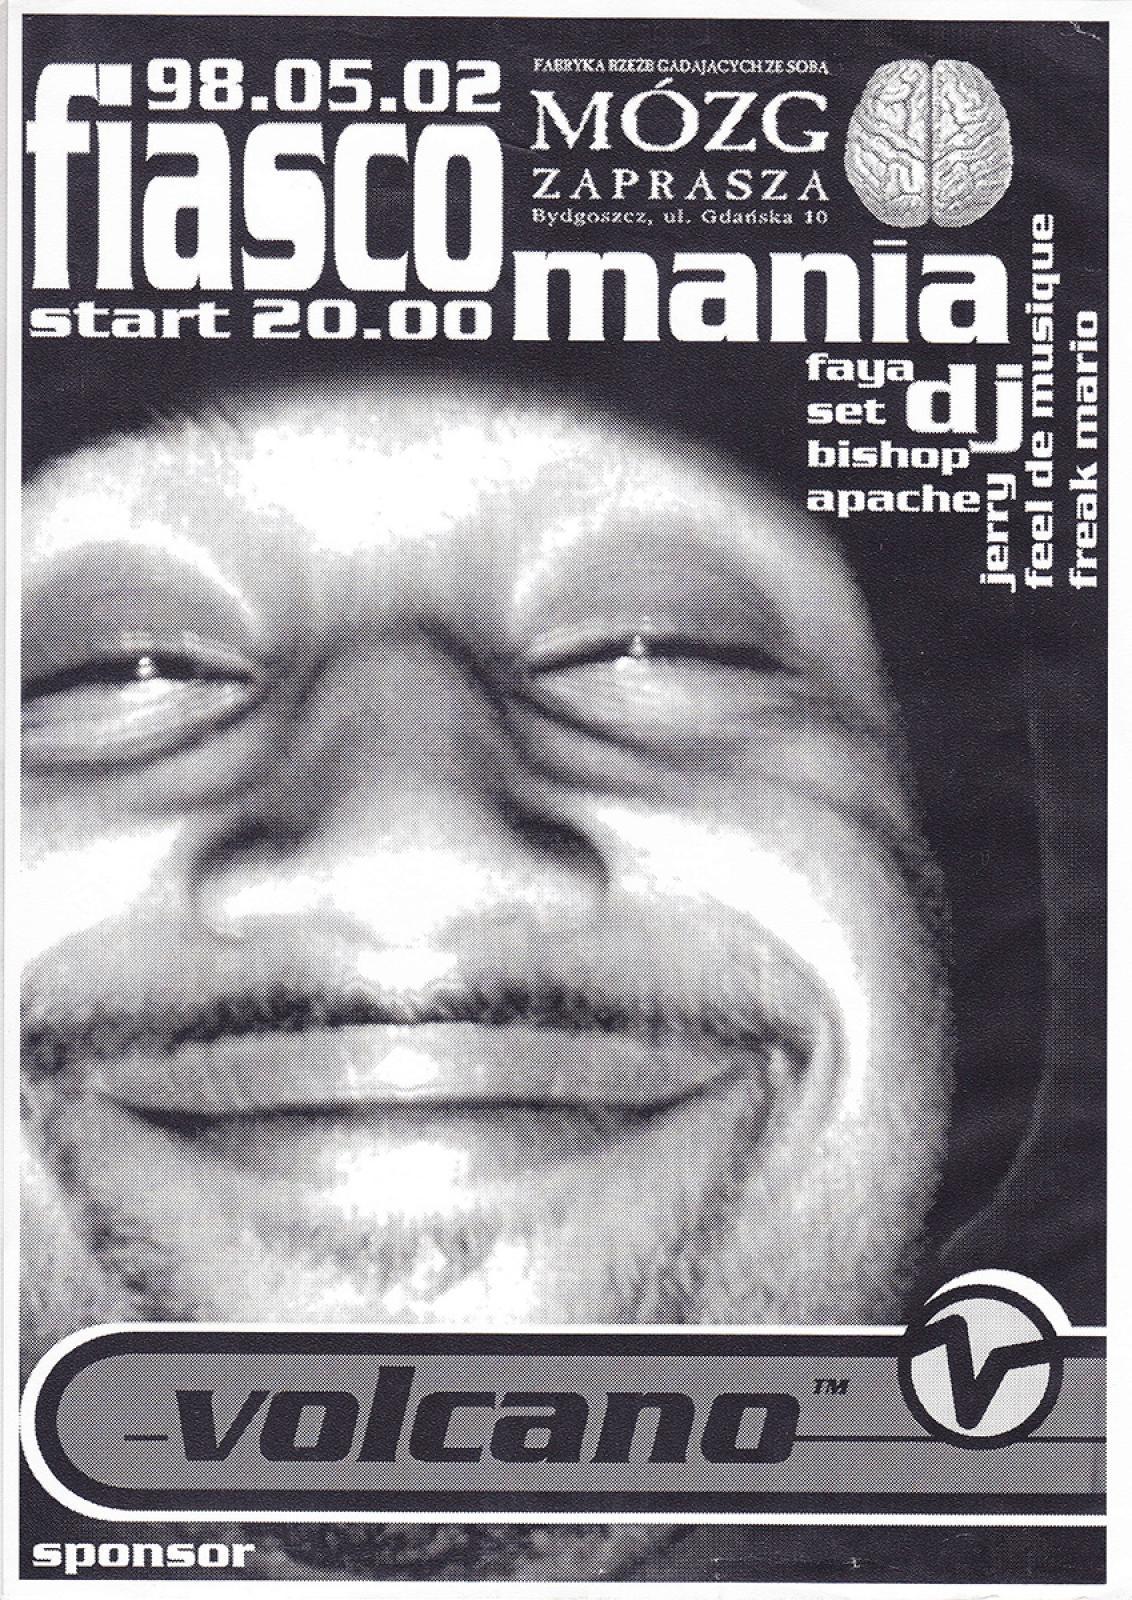 Fiascomania